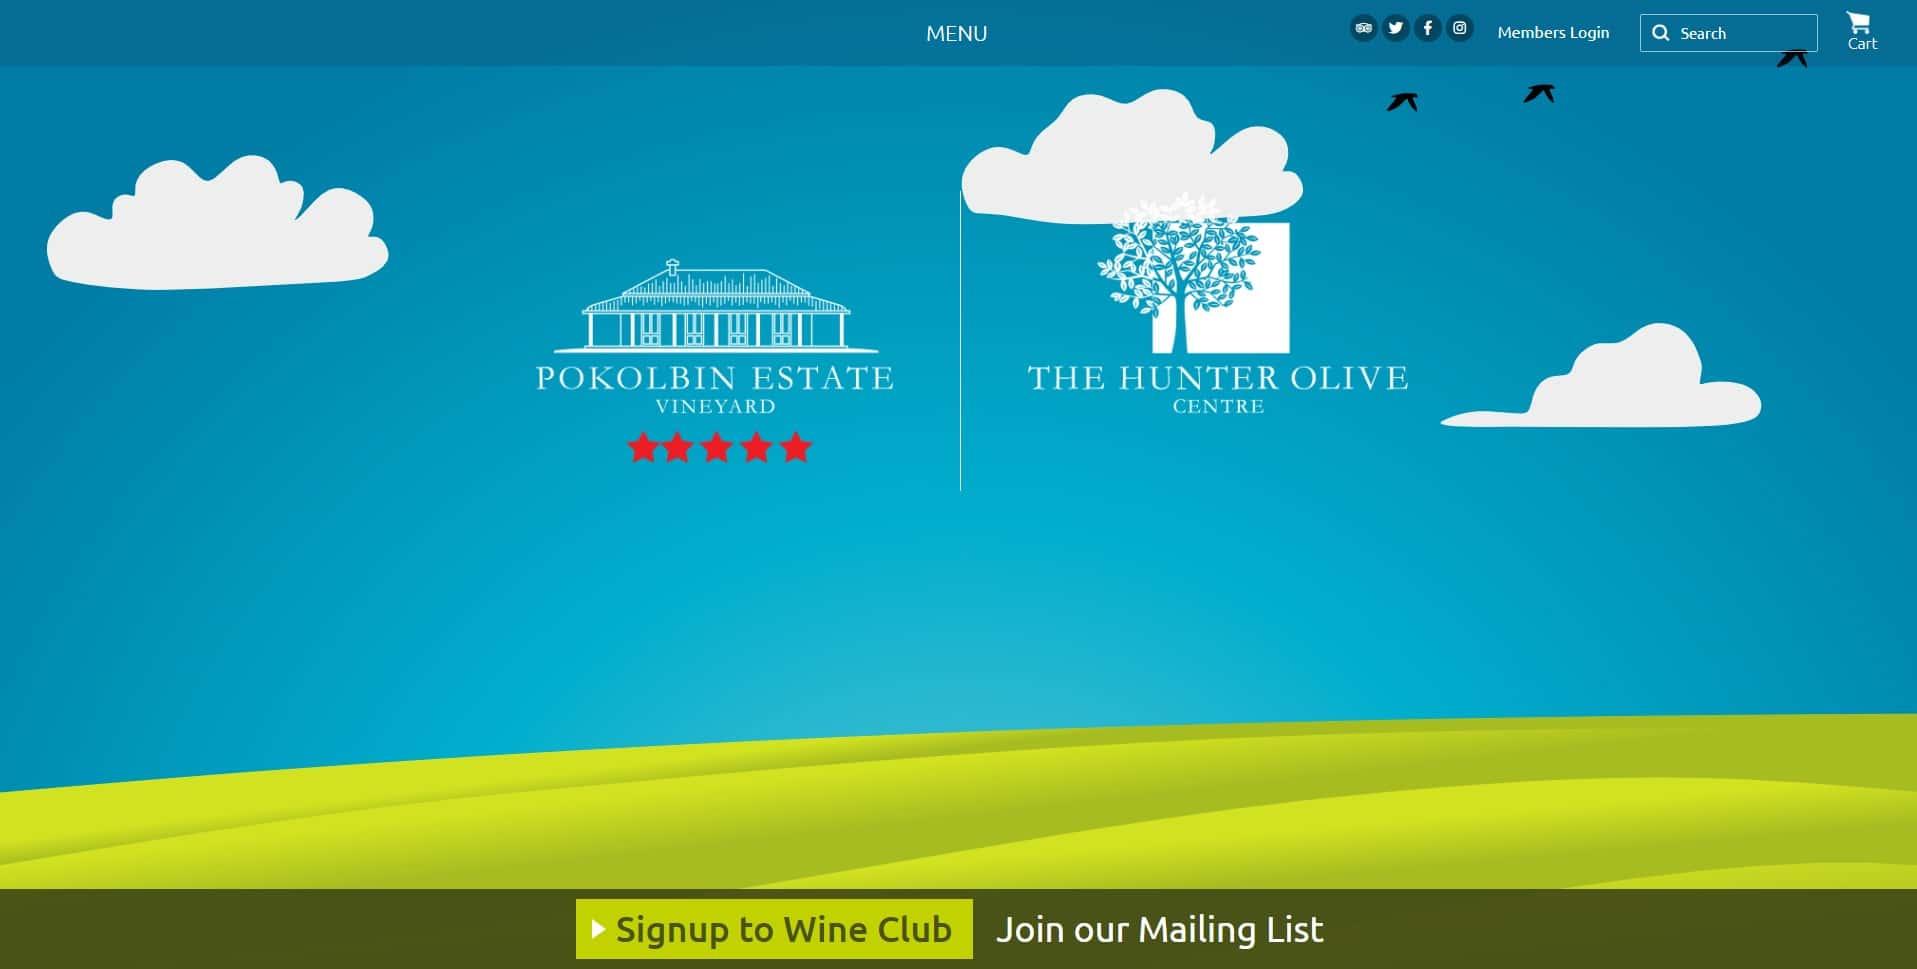 Pokolbin Estate Vineyard Website Design & SEO Northern Rivers NSW - JezNorthWeb